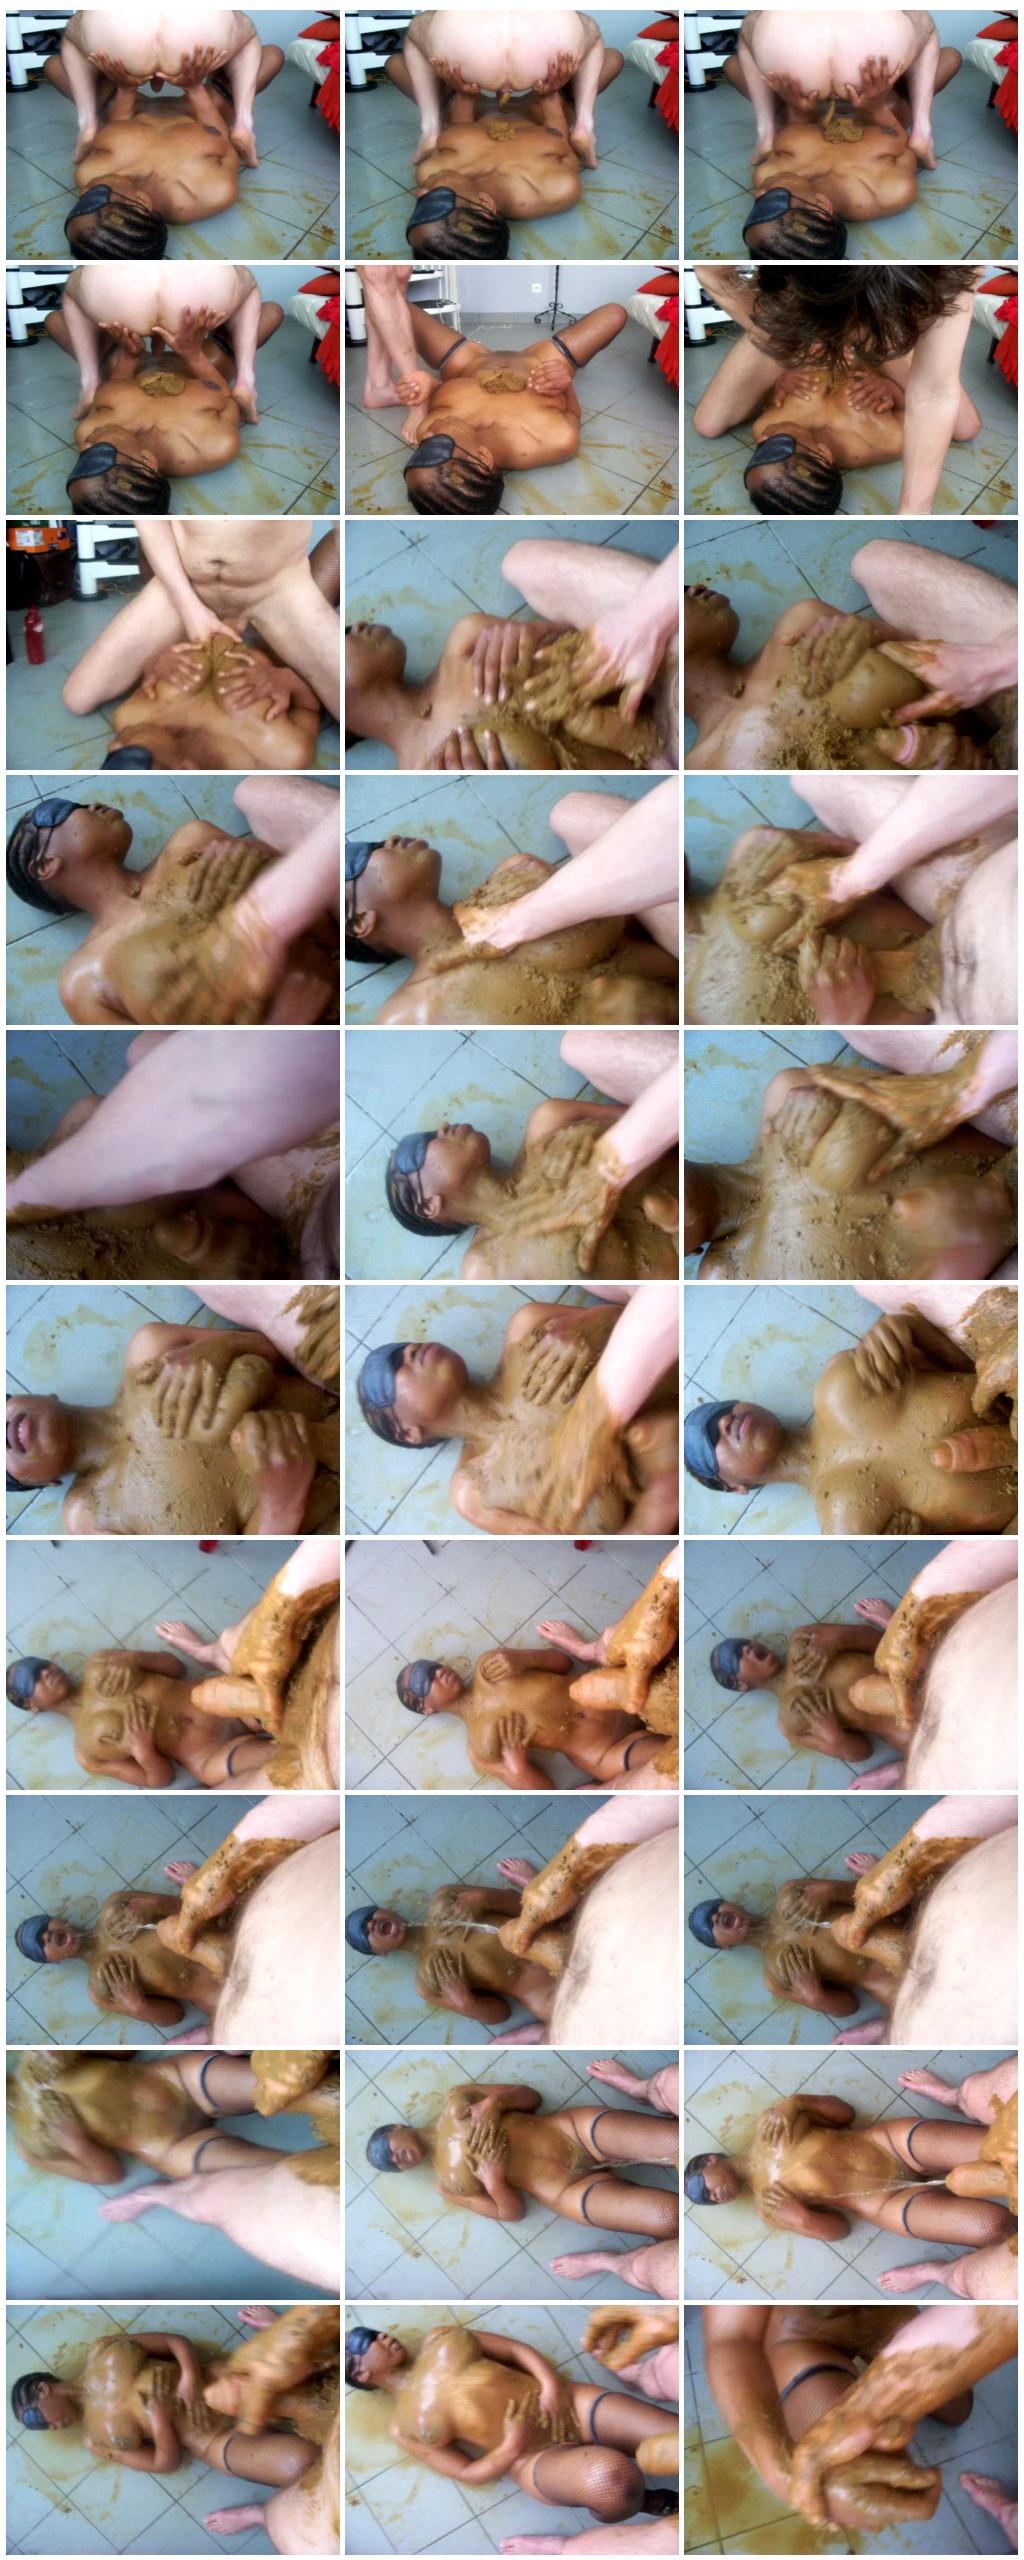 Ebony Scat sex part 2 Scat sex Smearing Oral sex Masturbation pissingToilet SlaveryHandjob Eat shit thumb - Ebony Scat sex part 2-[Scat sex,  Smearing, Oral sex, Masturbation, pissing,Toilet Slavery, Handjob, Eat shit]